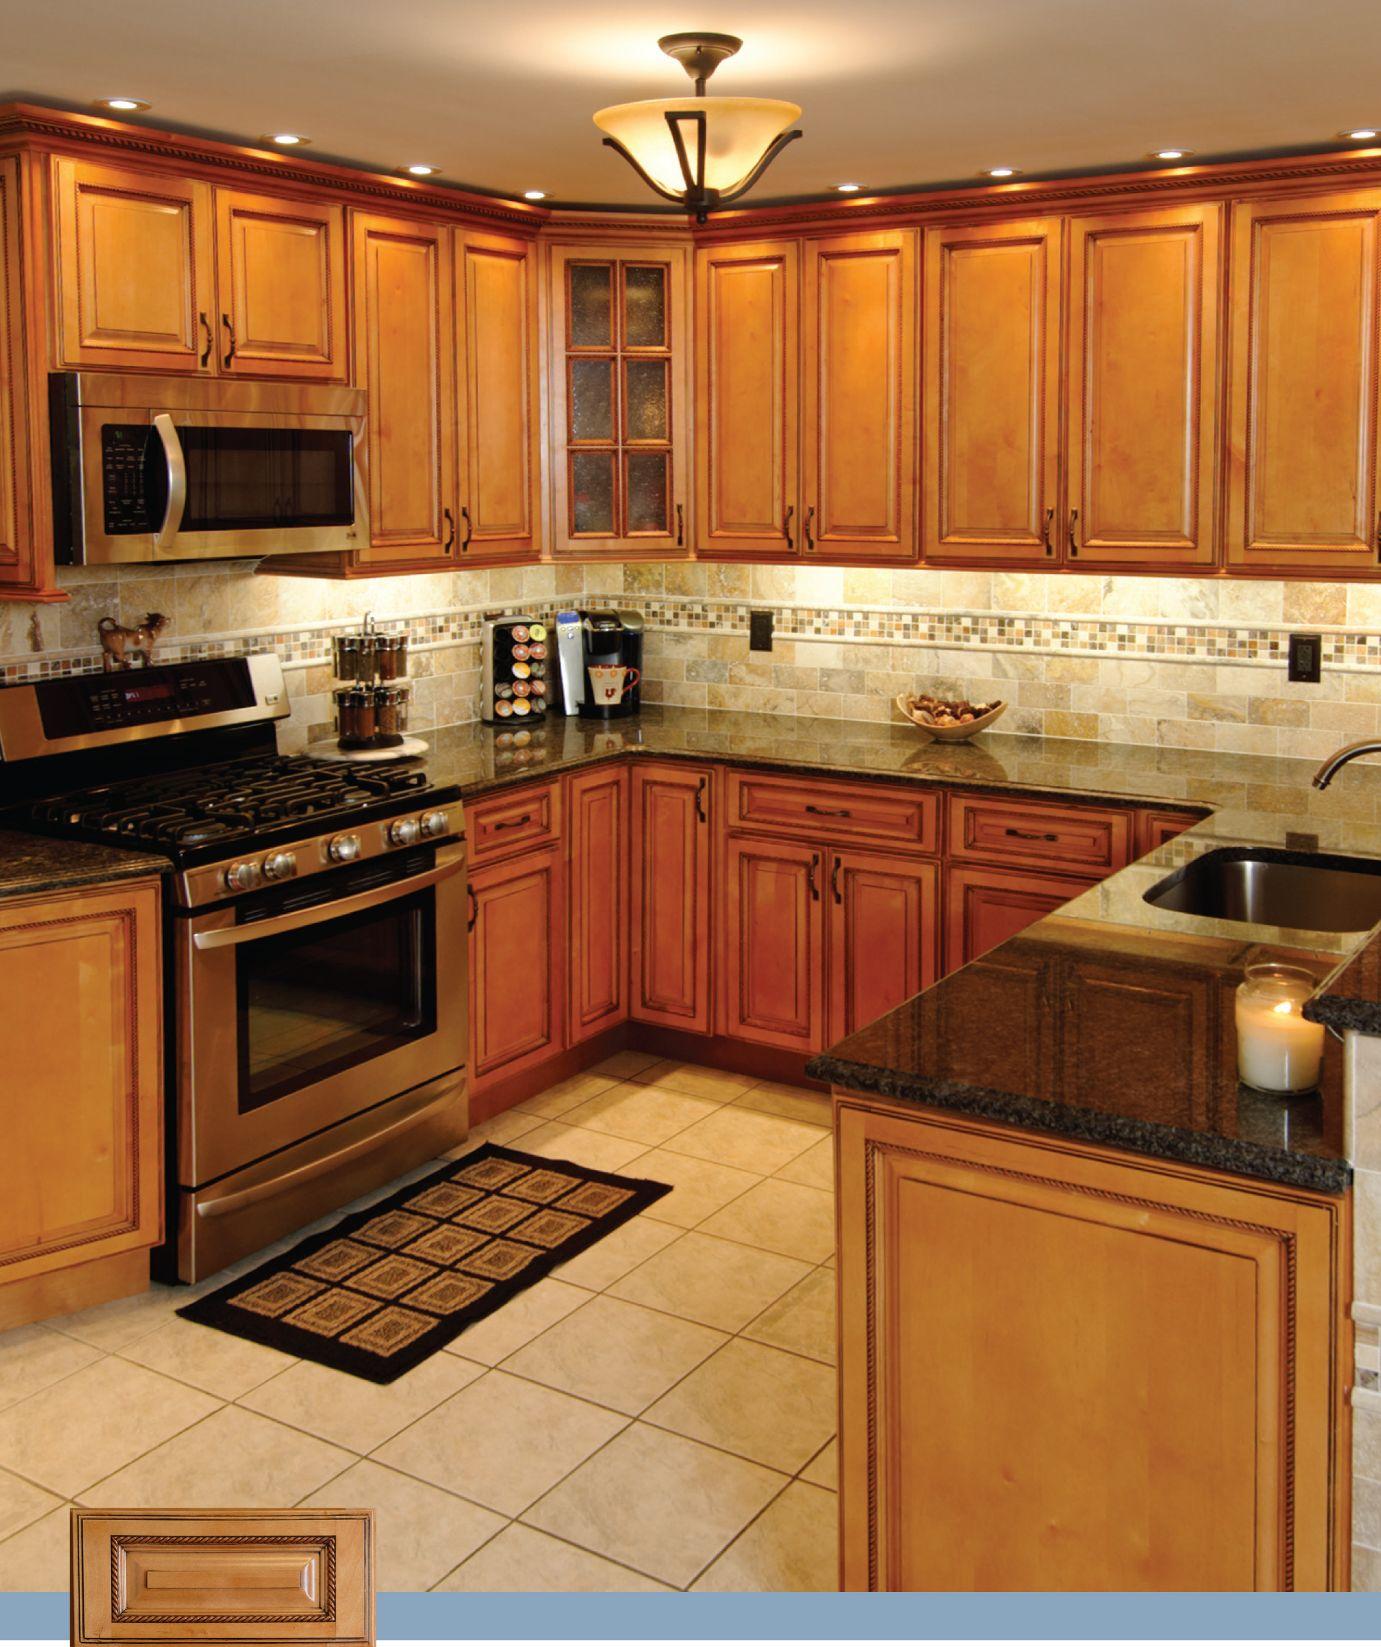 rtacabinetsmapleoakbamboo bamboo kitchen cabinets KCD Light Caramel Rope KITCHEN RTA Cabinets RTA Kitchen Cabinet Discount Cabinets MAPLE OAK BAMBOO BIRCH